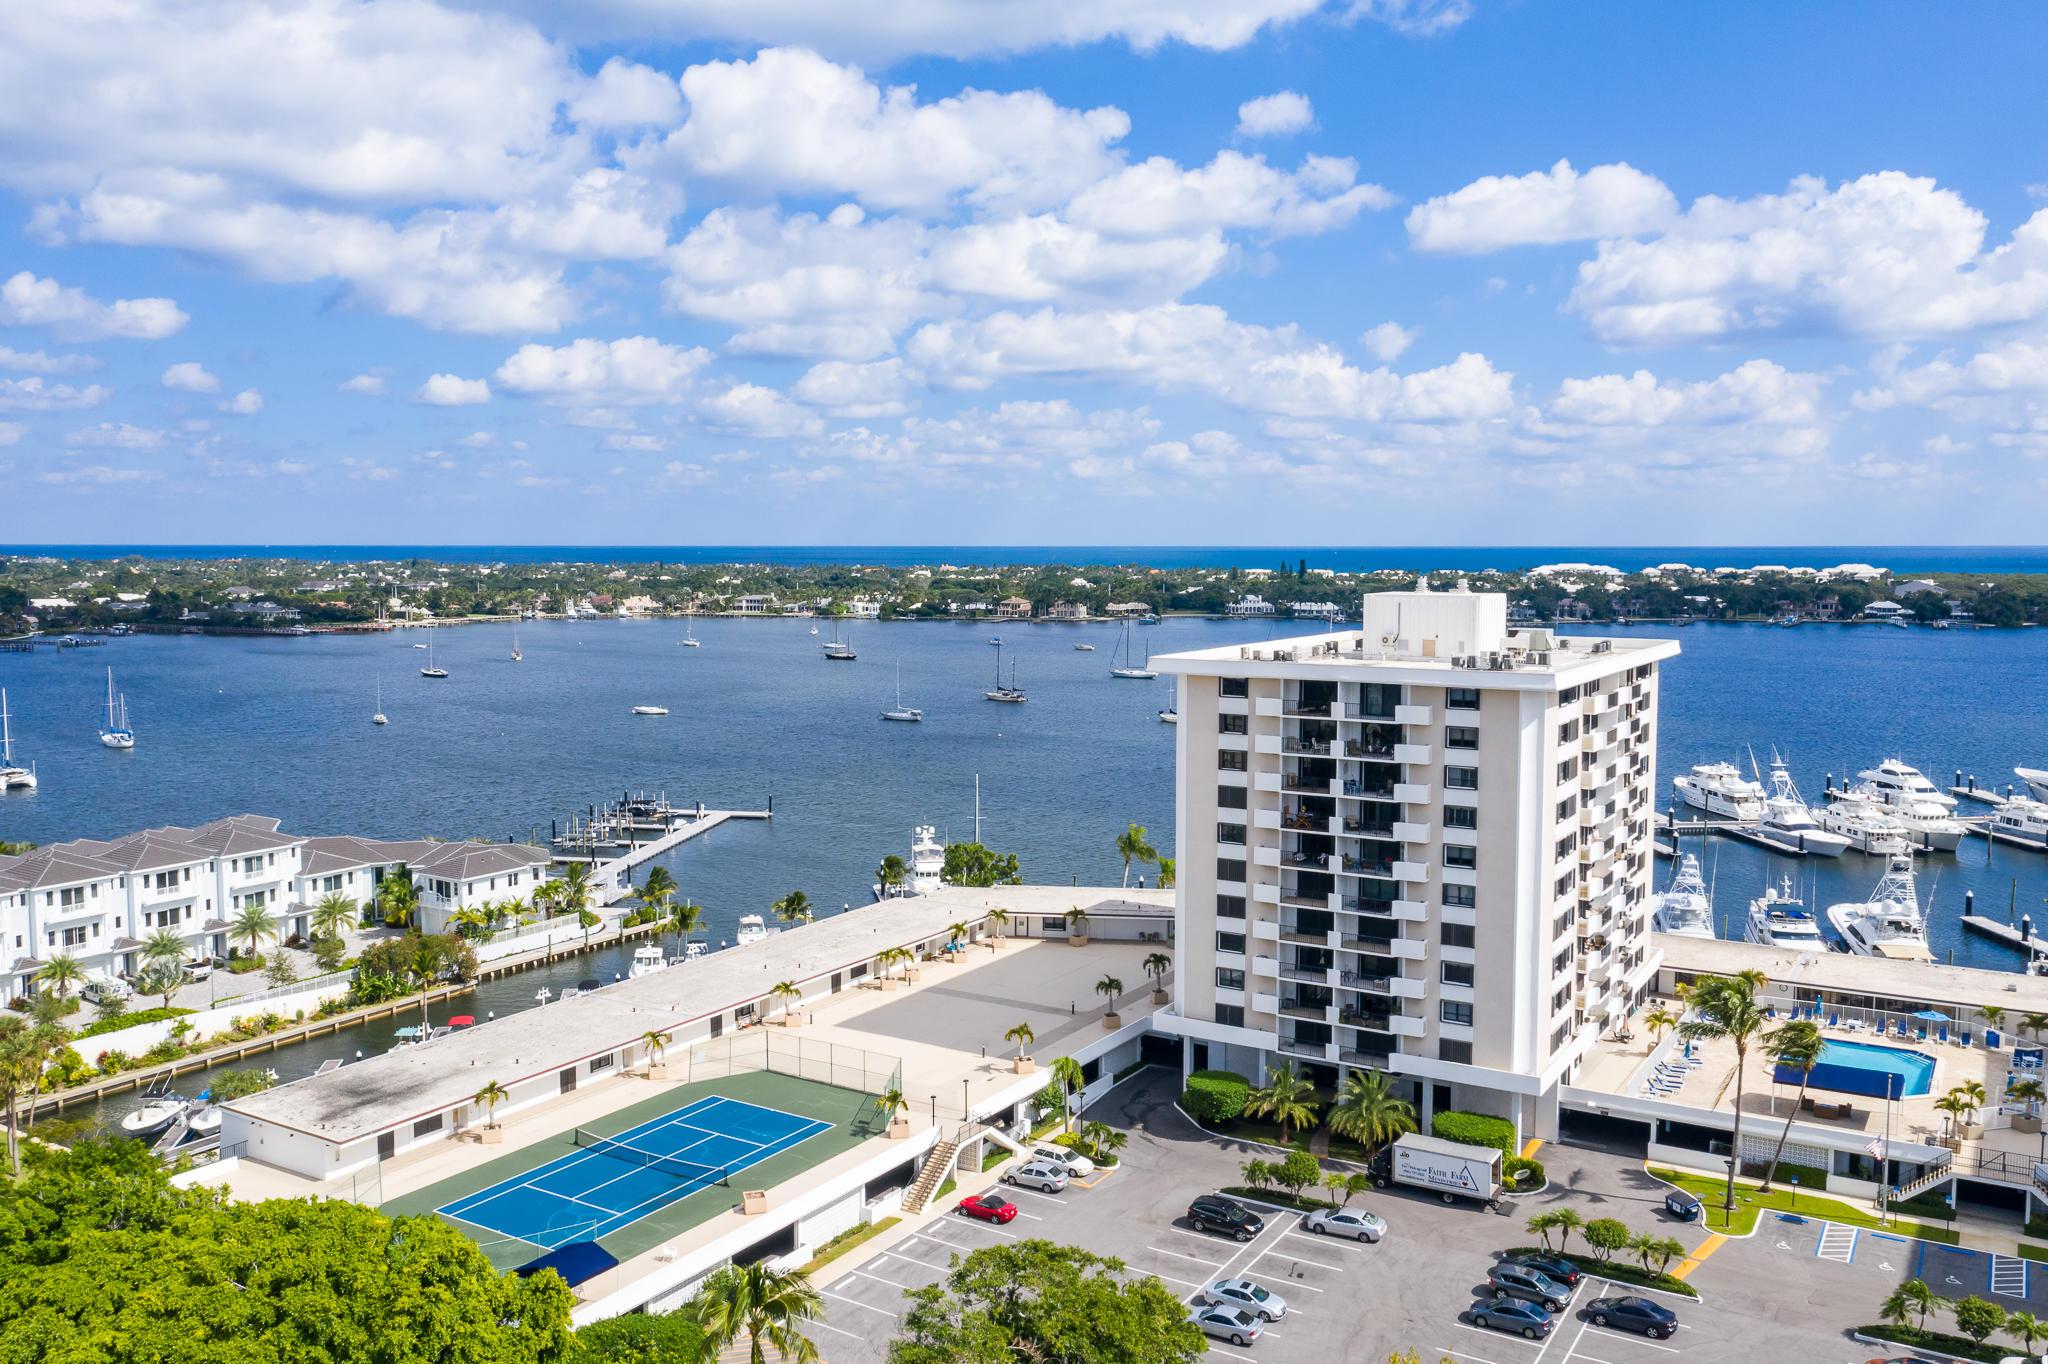 1208 Marine Way 706, North Palm Beach, Florida 33408, 2 Bedrooms Bedrooms, ,2 BathroomsBathrooms,A,Condominium,Marine,RX-10512007